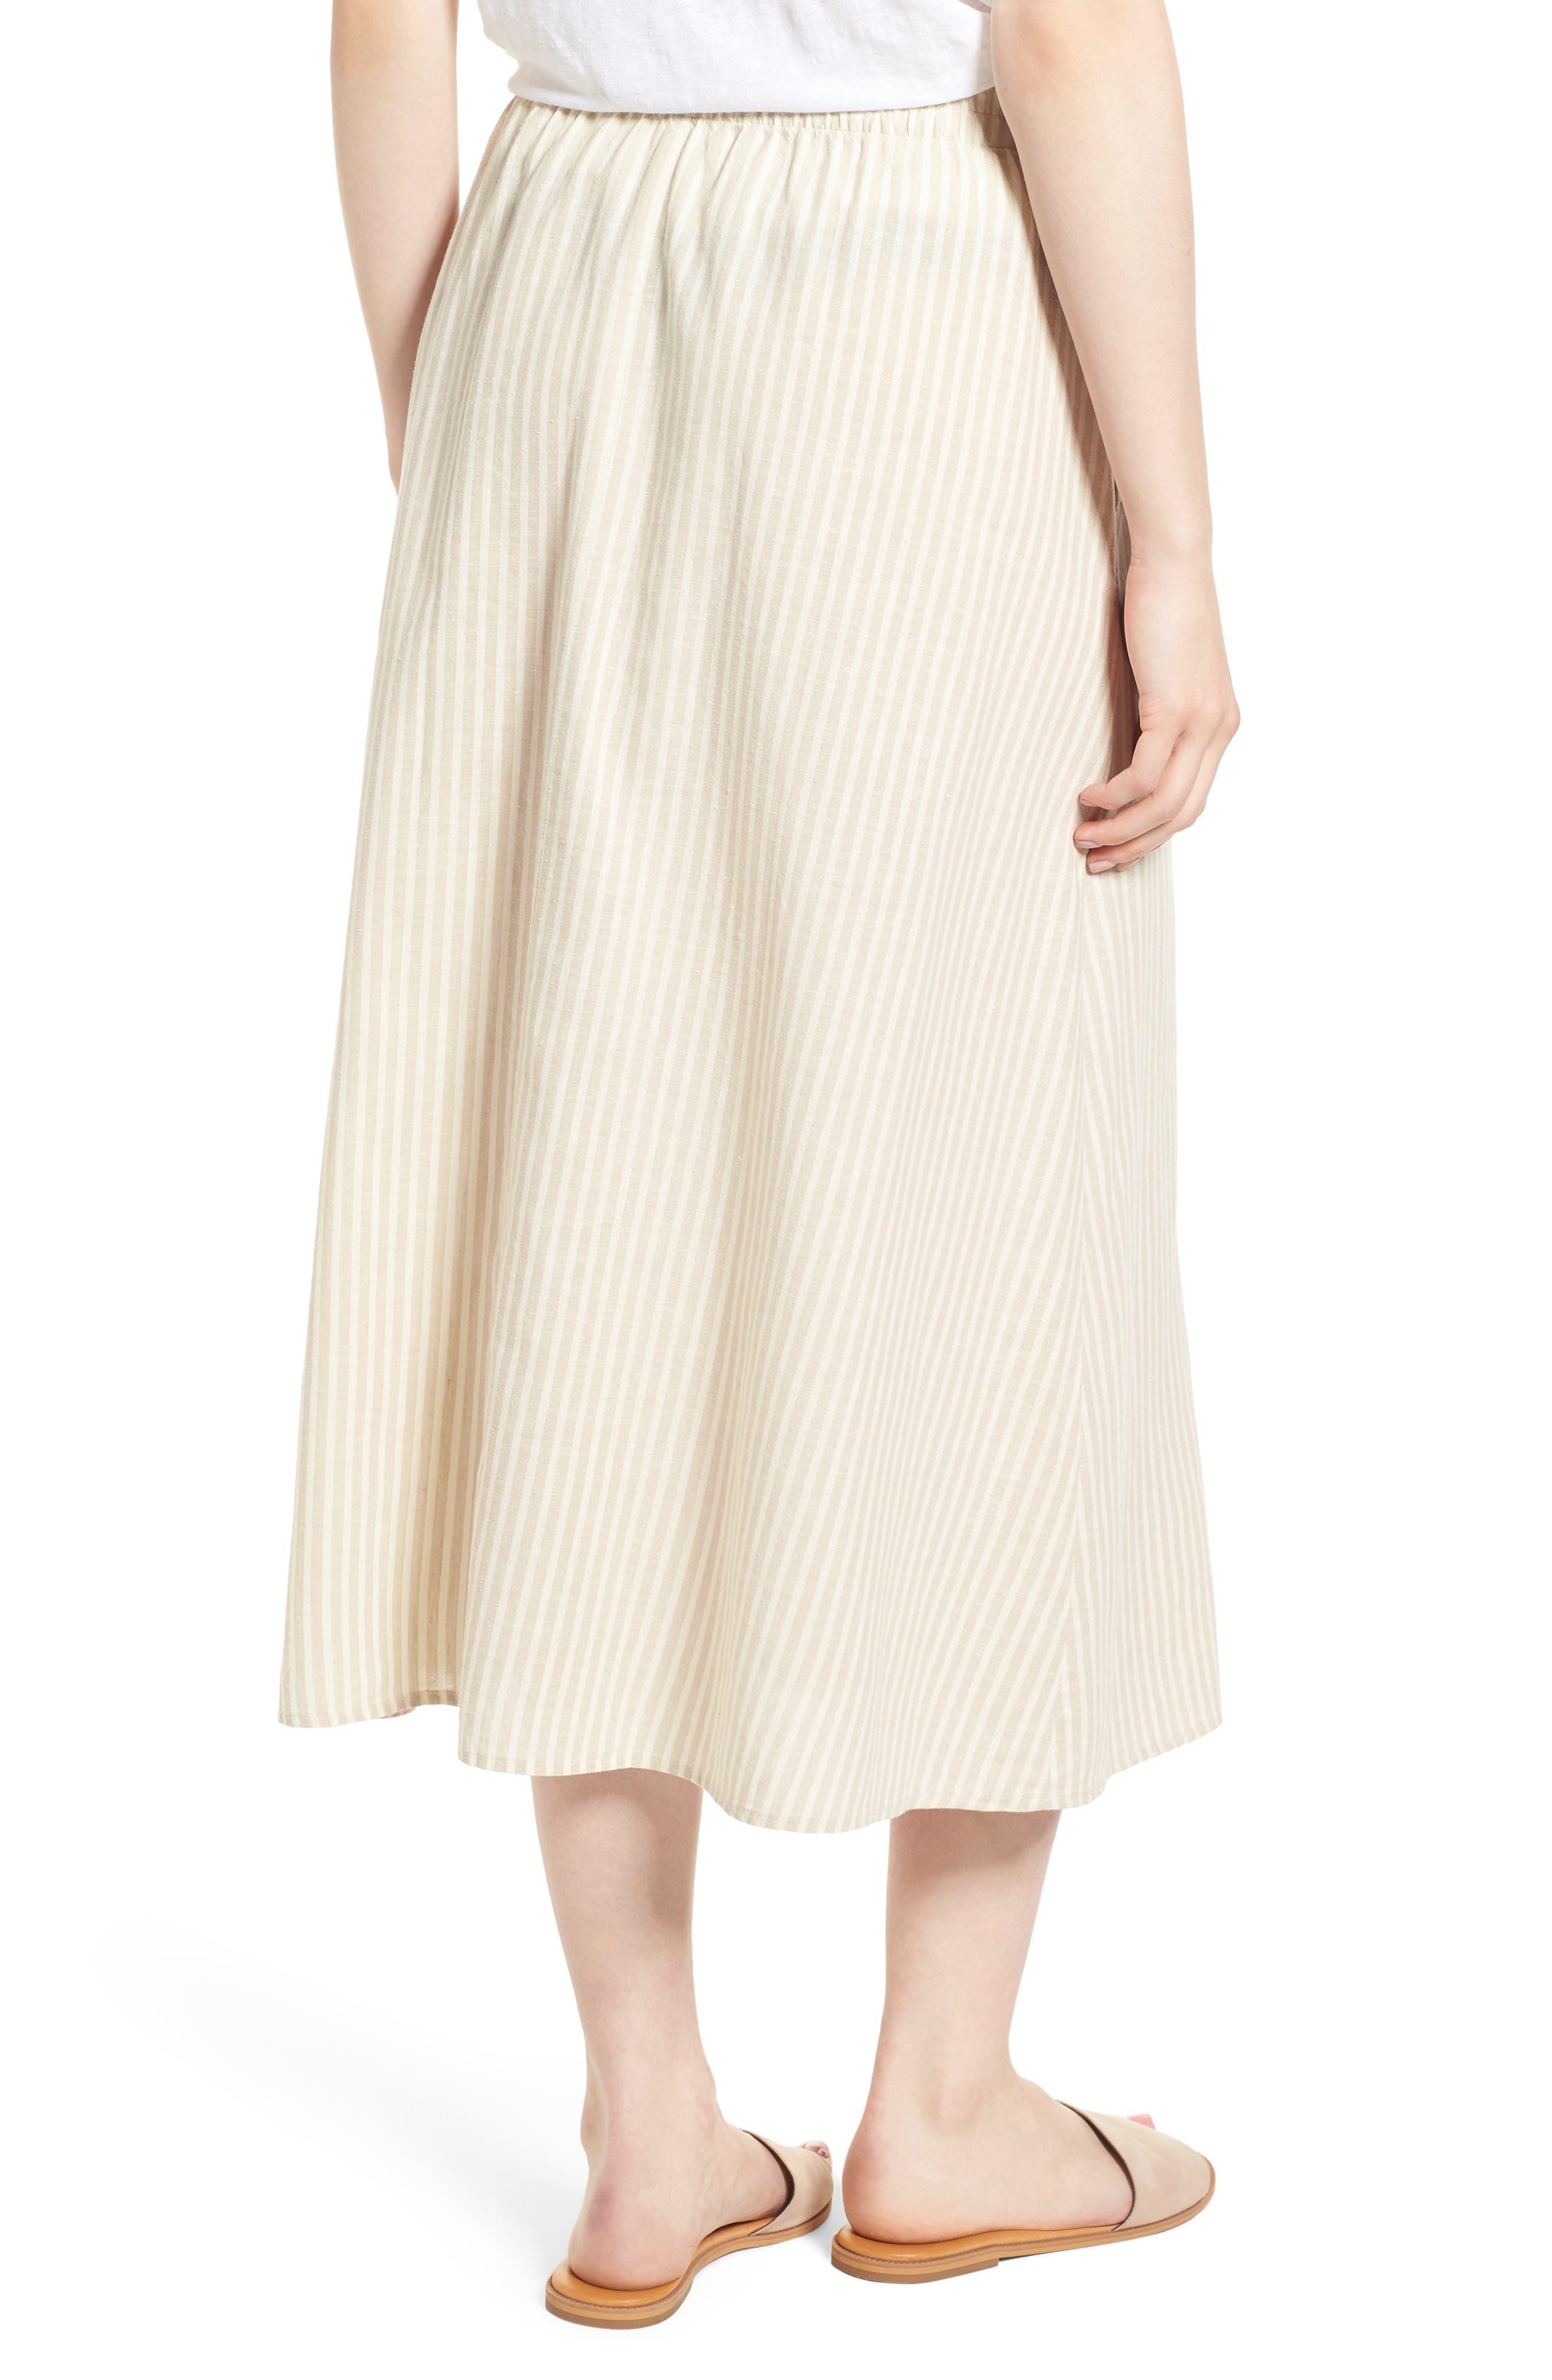 EILEEN FISHER,                             Stripe Hemp & Organic Cotton Midi Skirt,                             Alternate thumbnail 2, color,                             257